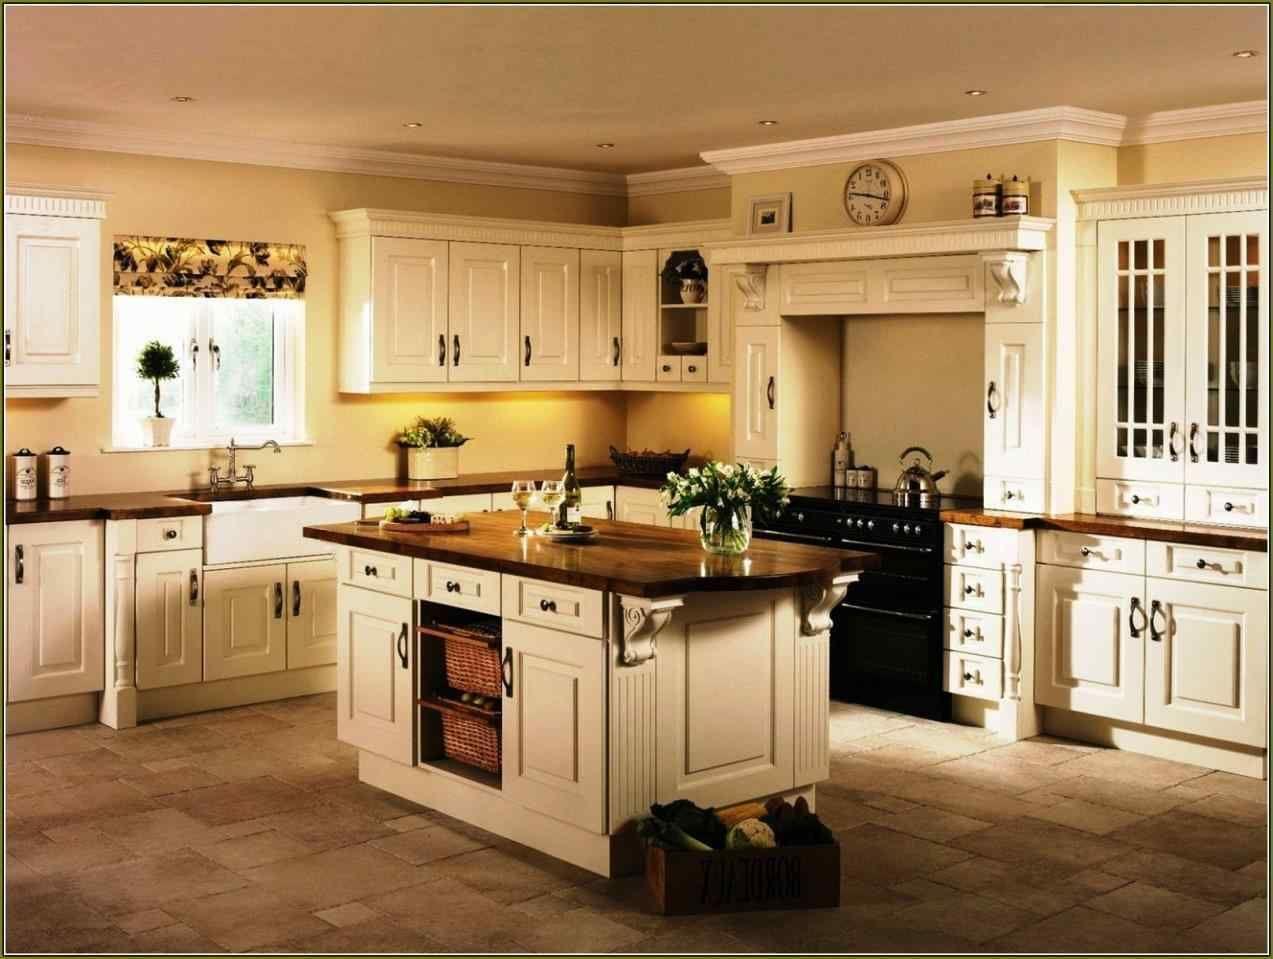 10 Kitchen Island Centerpiece Ideas 2020 The Extra Decor In 2020